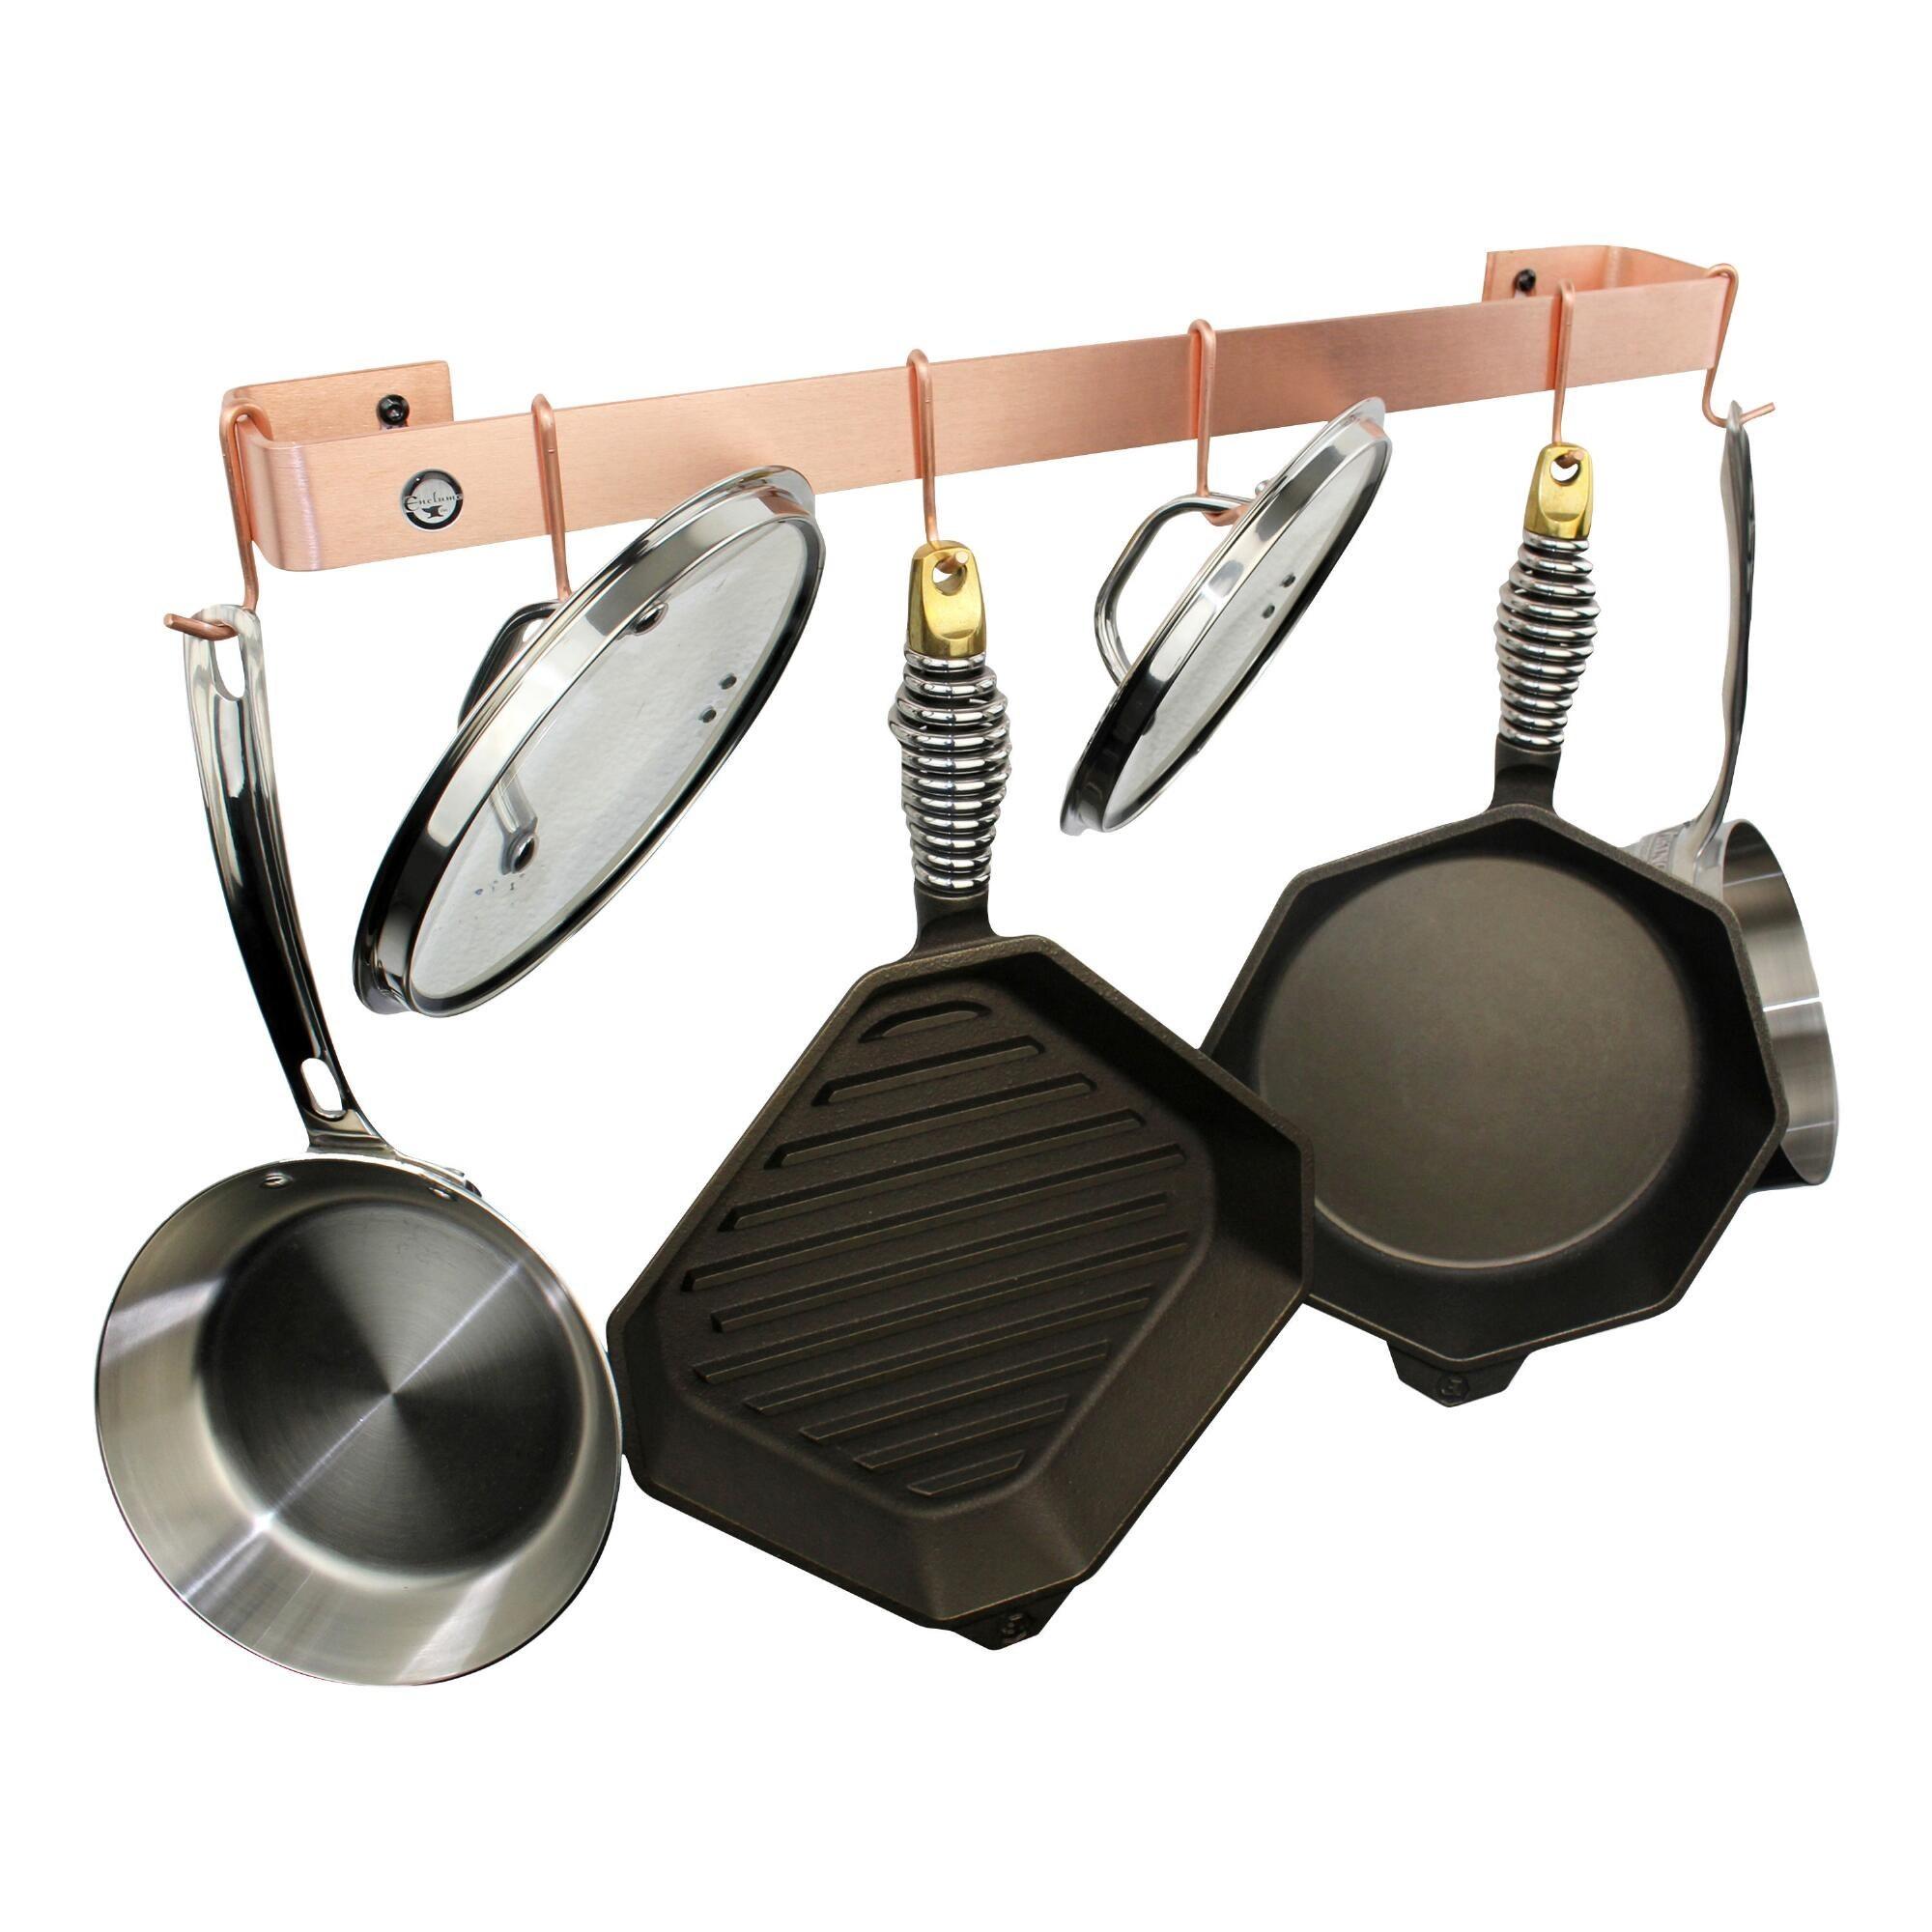 The rack holinng pots, pans, and lids